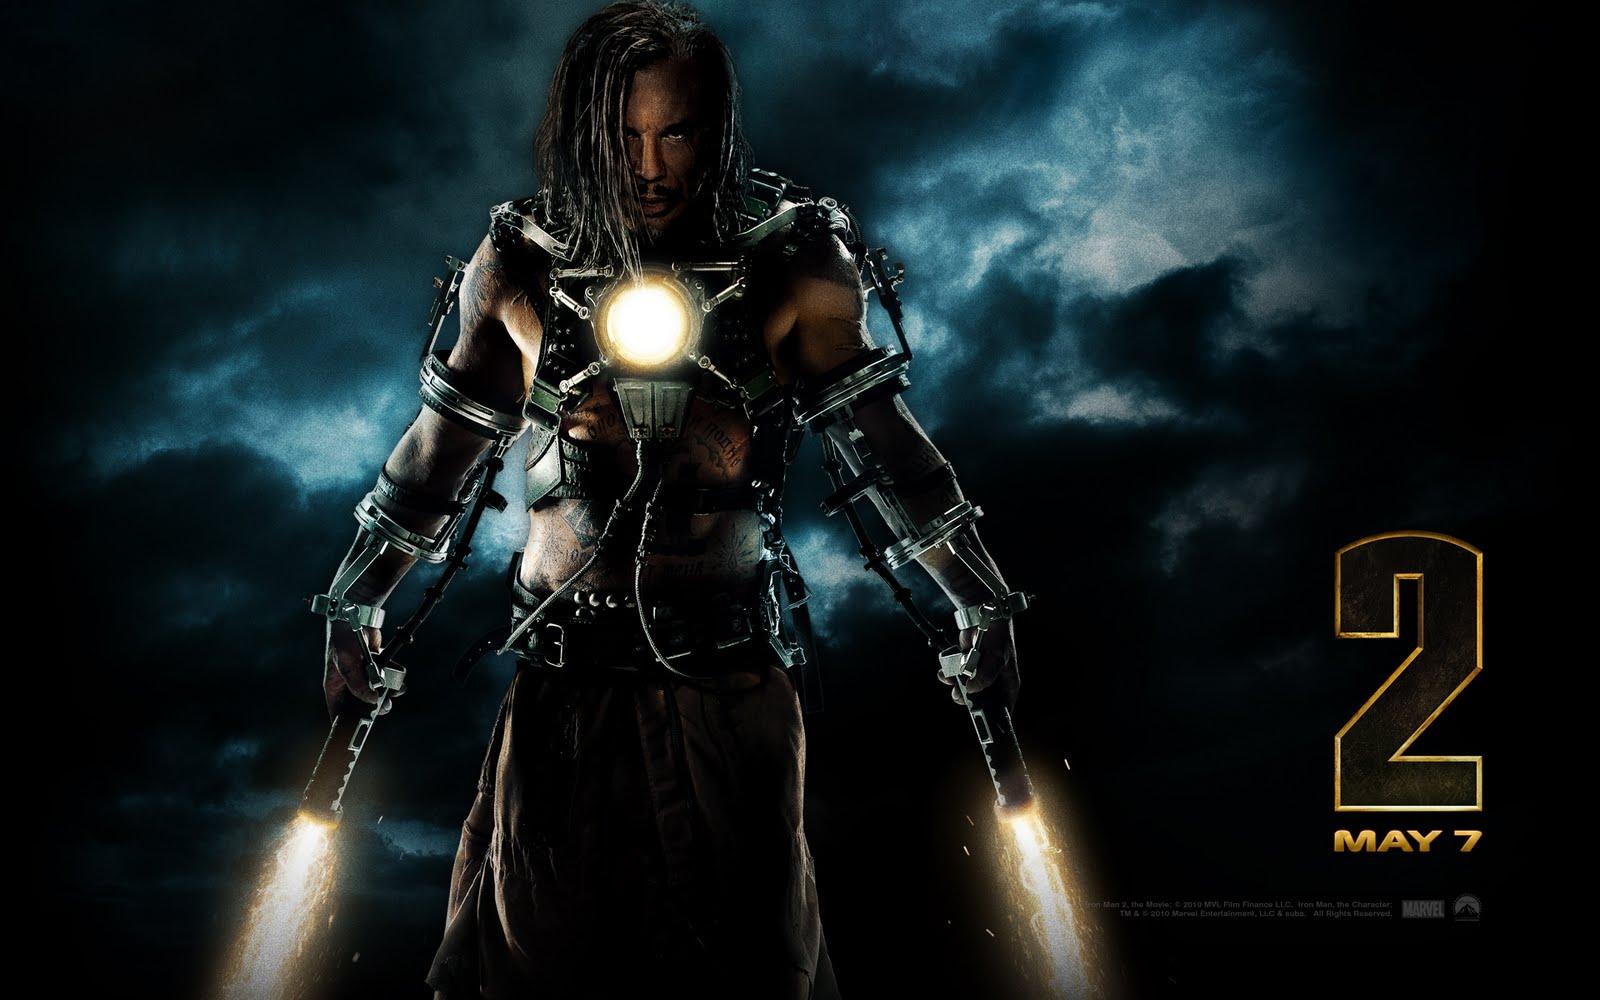 http://2.bp.blogspot.com/_6YBW5OgZA4E/S7XWPPMauxI/AAAAAAAAAOs/AKwvz2wm9dg/s1600/Iron+Man+2+Whiplash.jpg